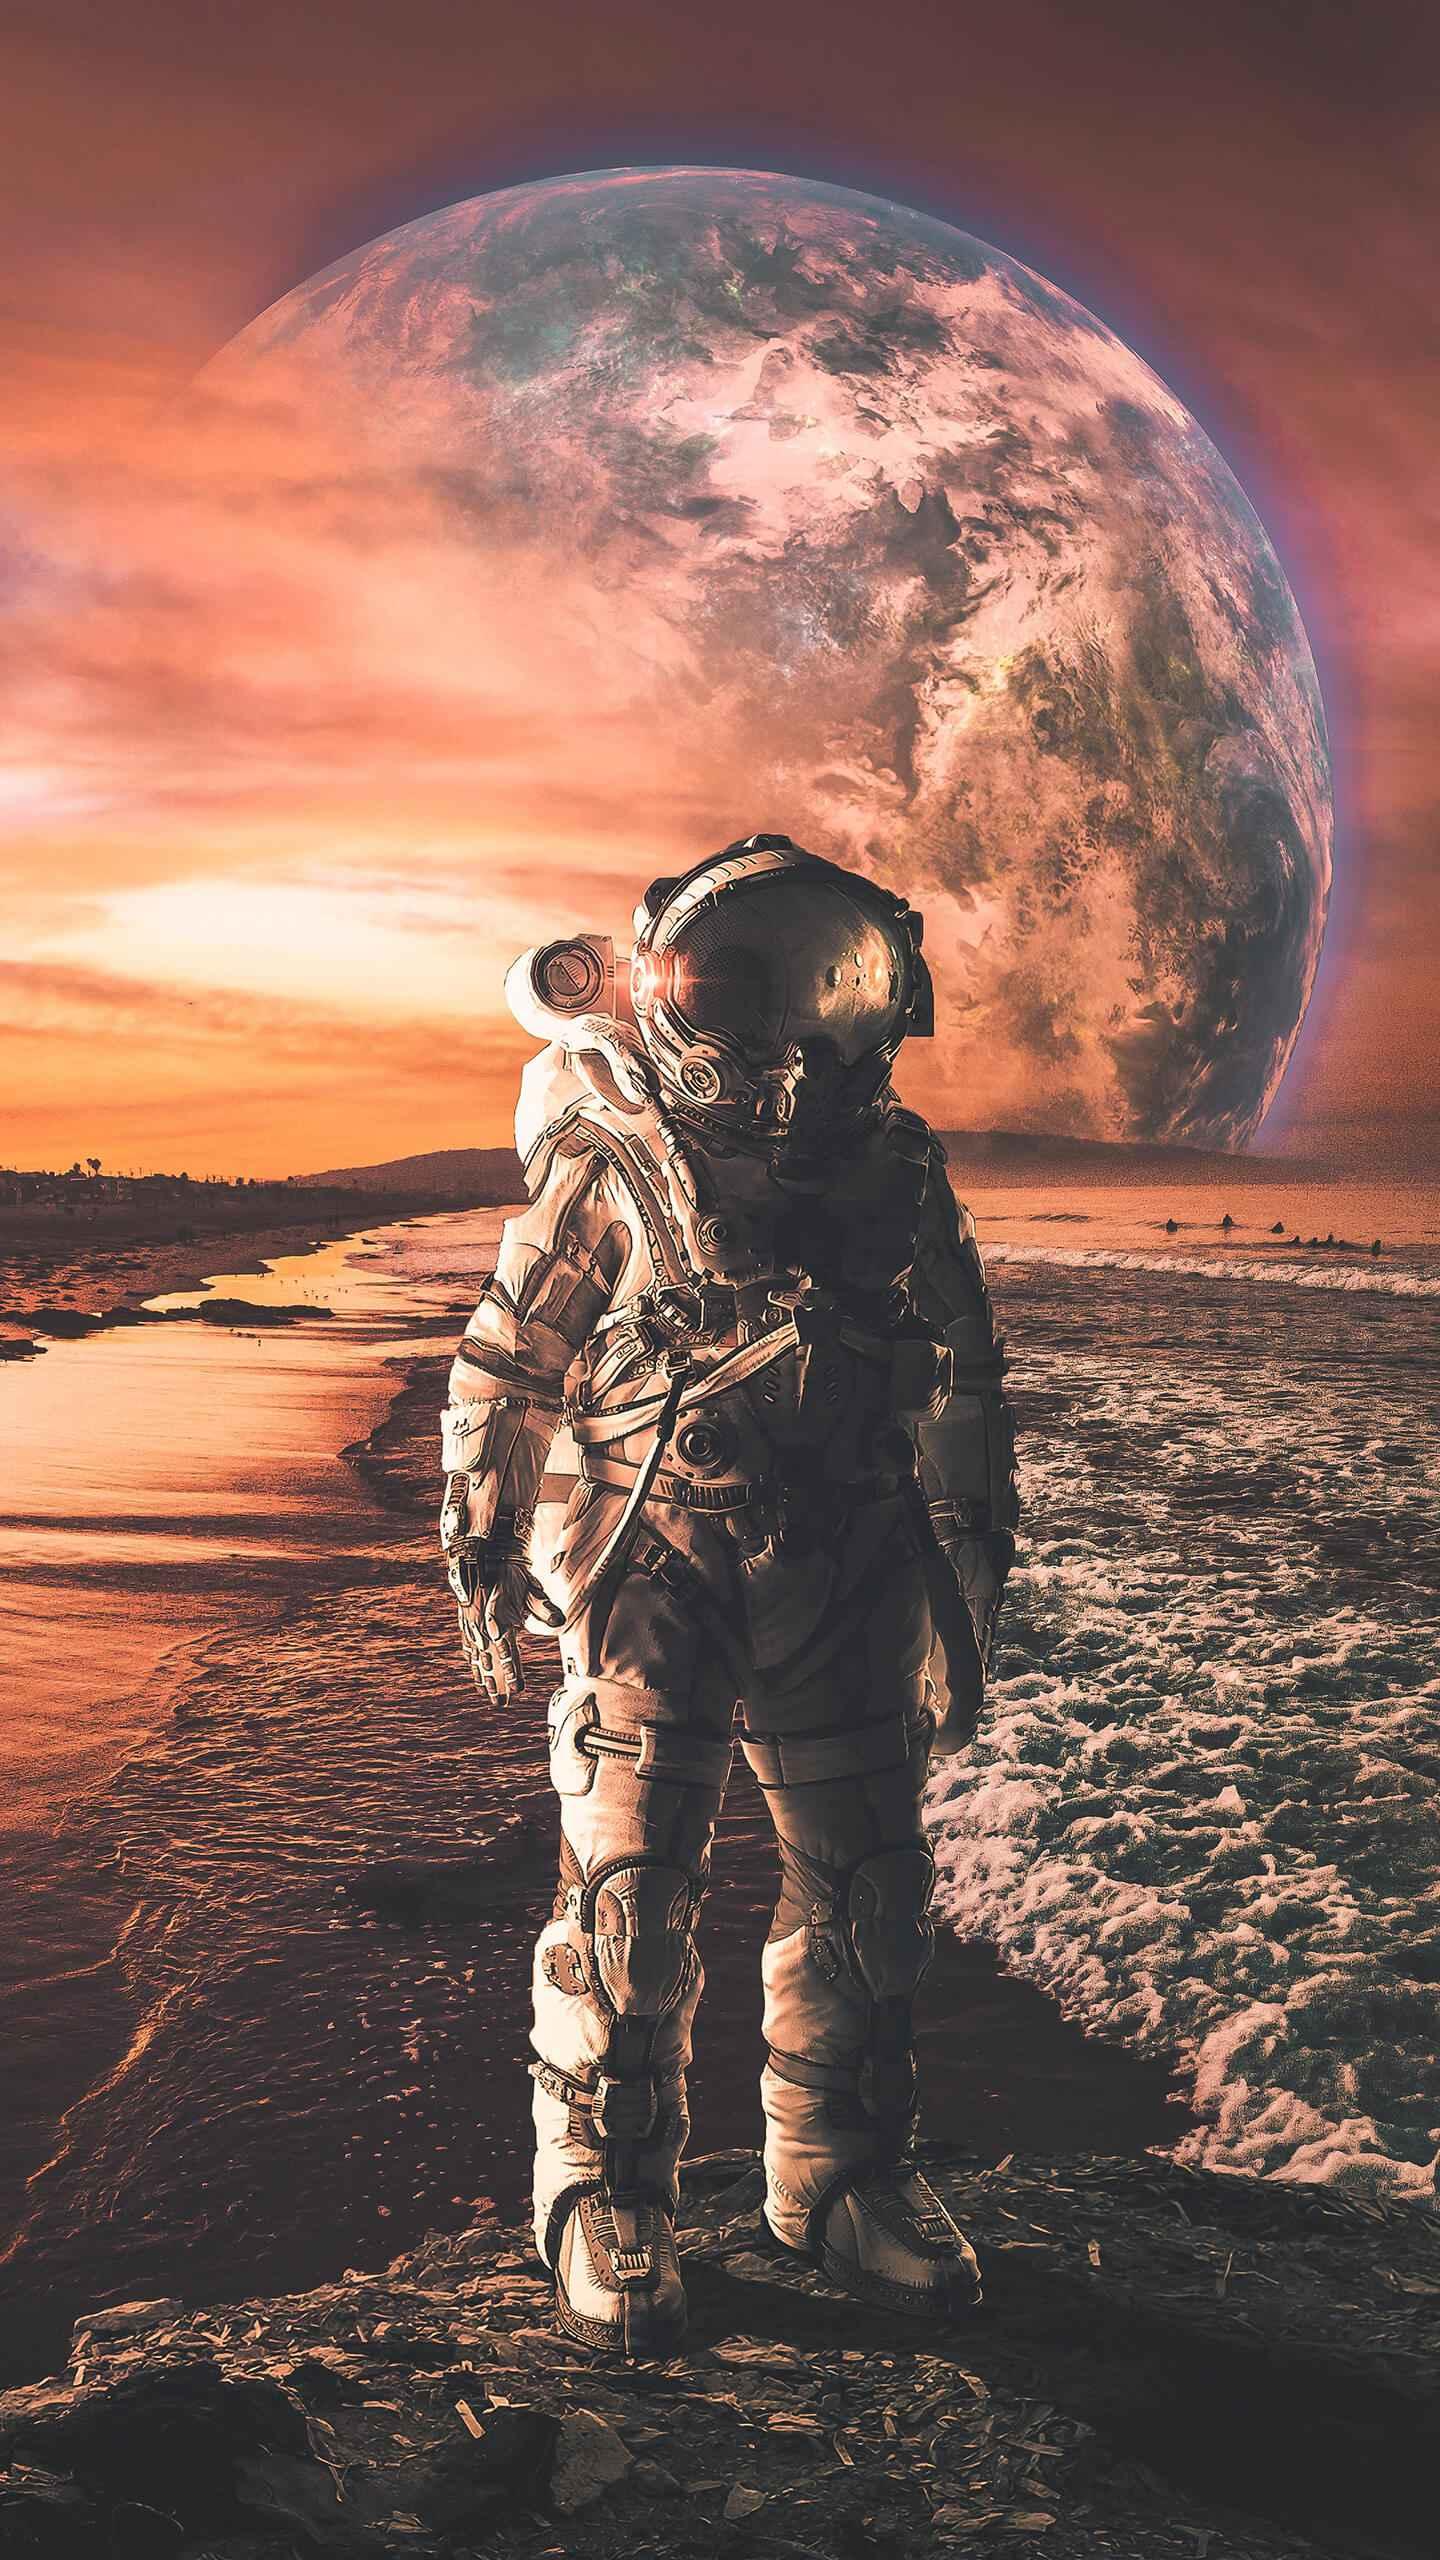 Interstellar Astronaut iPhone Wallpaper